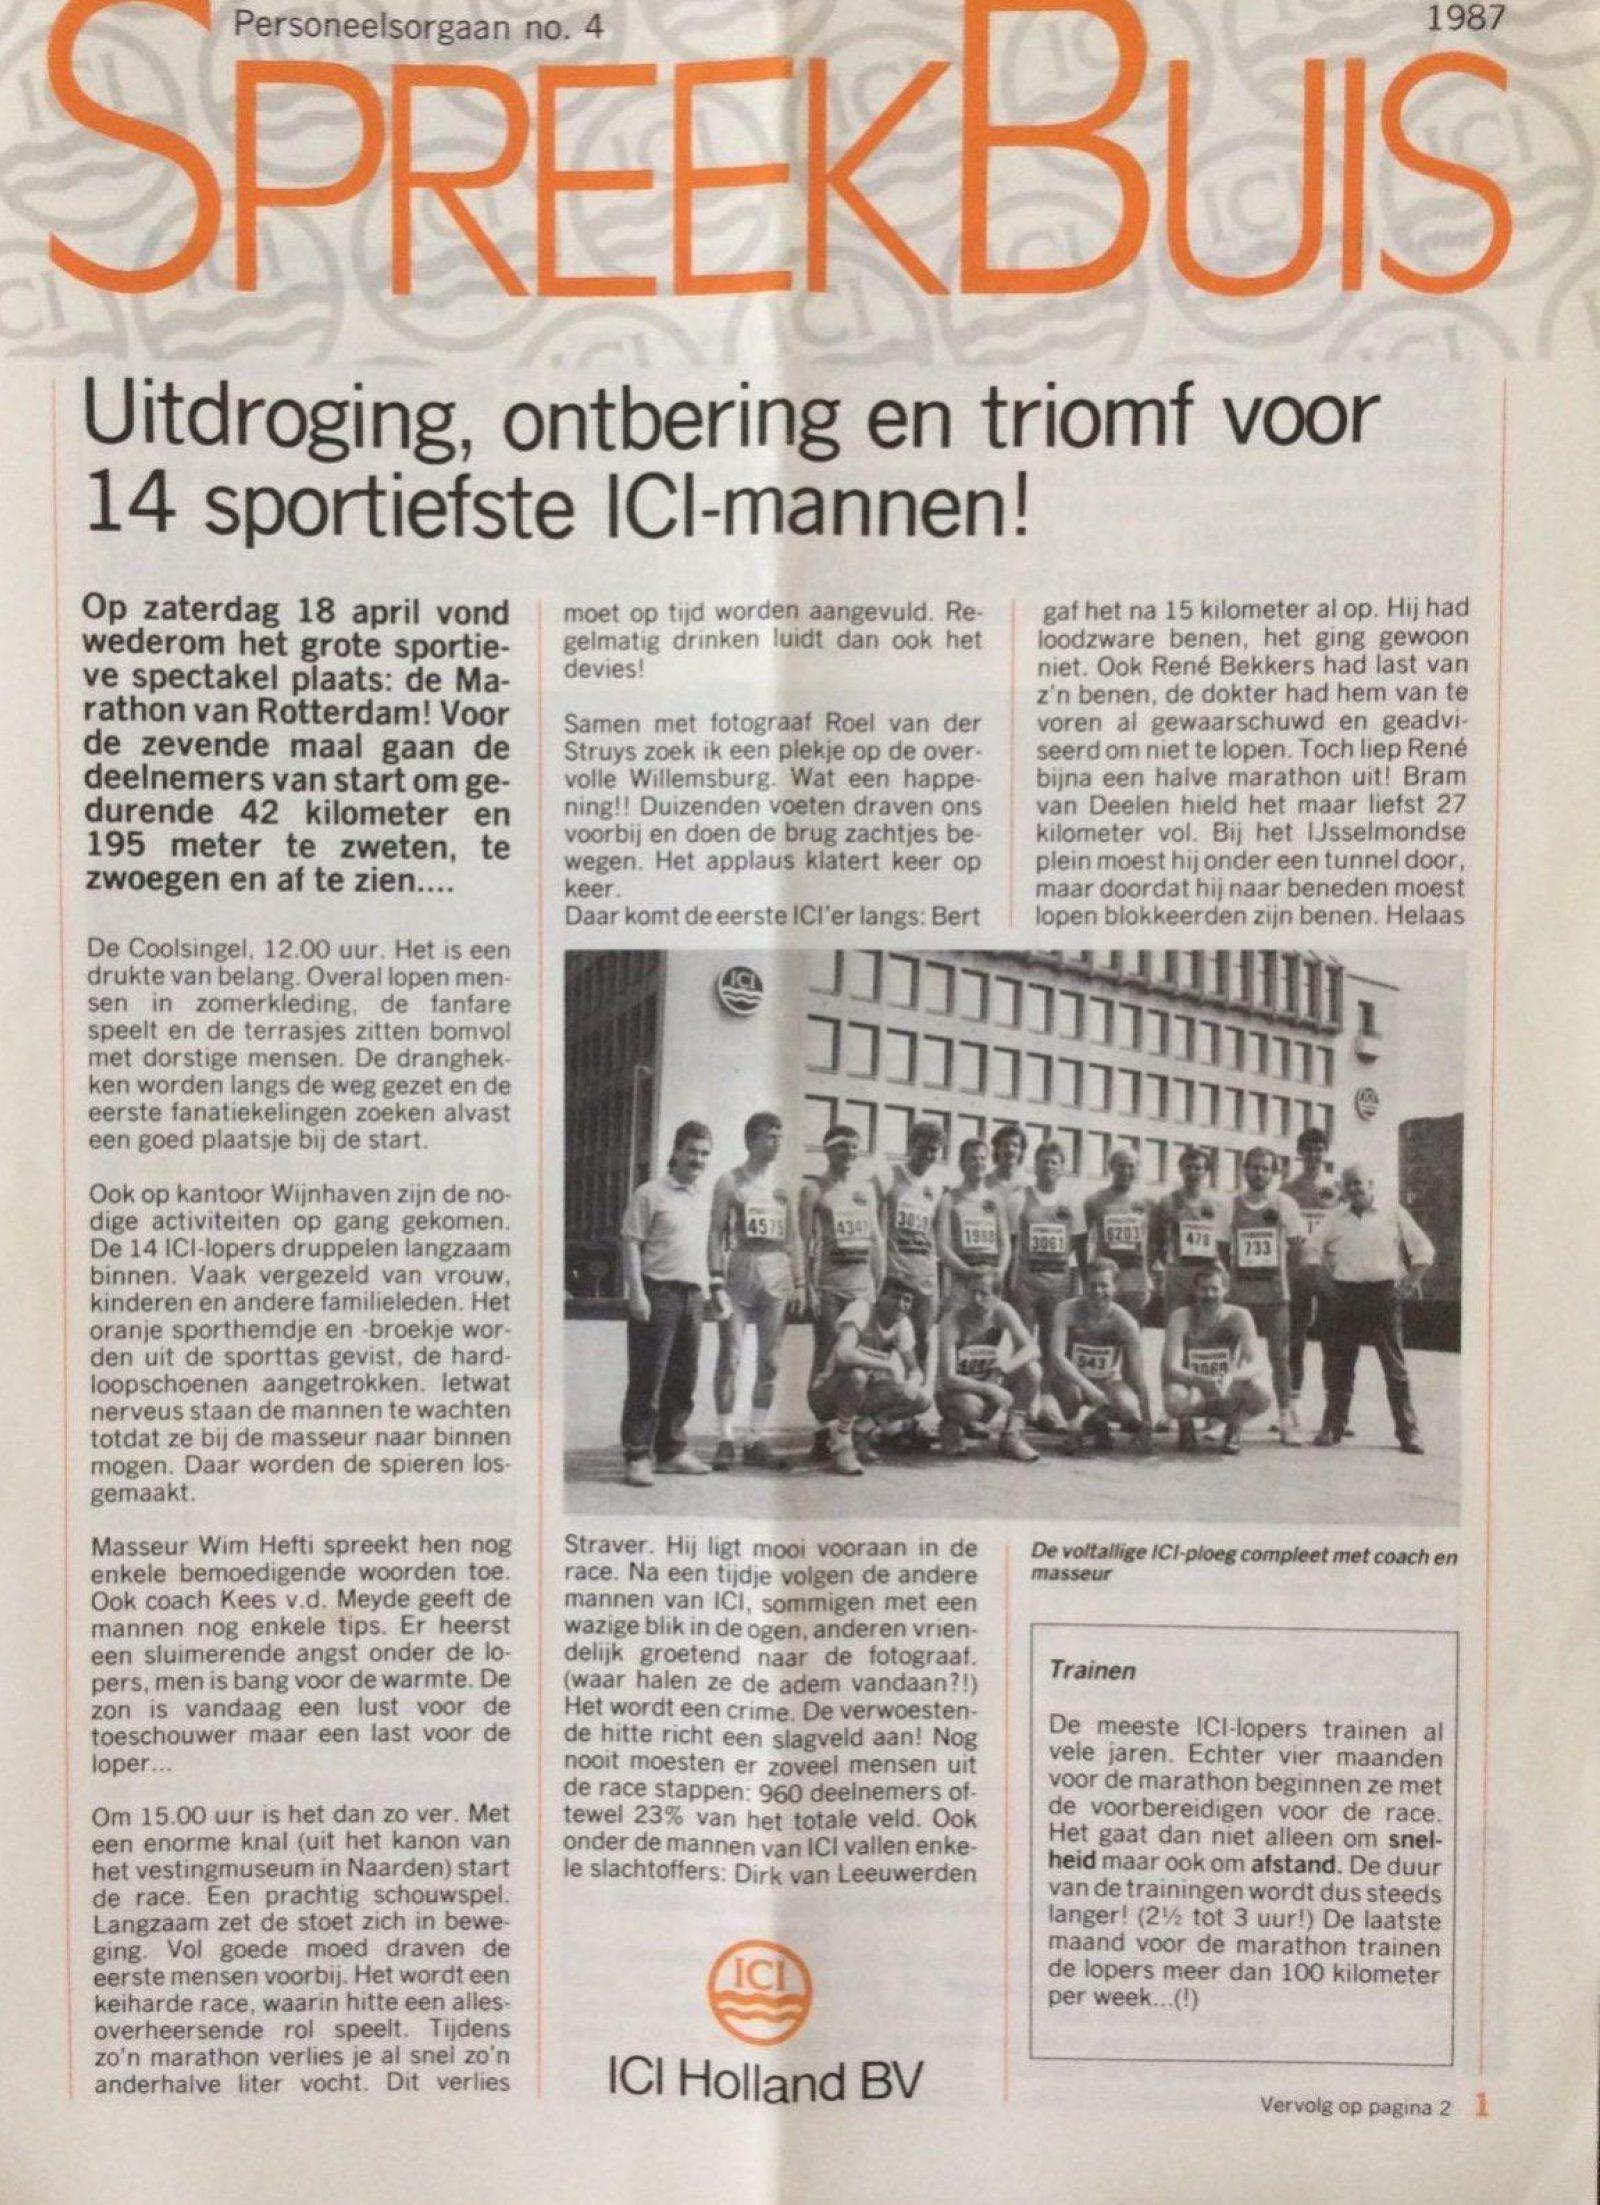 Spreekbuis 1987